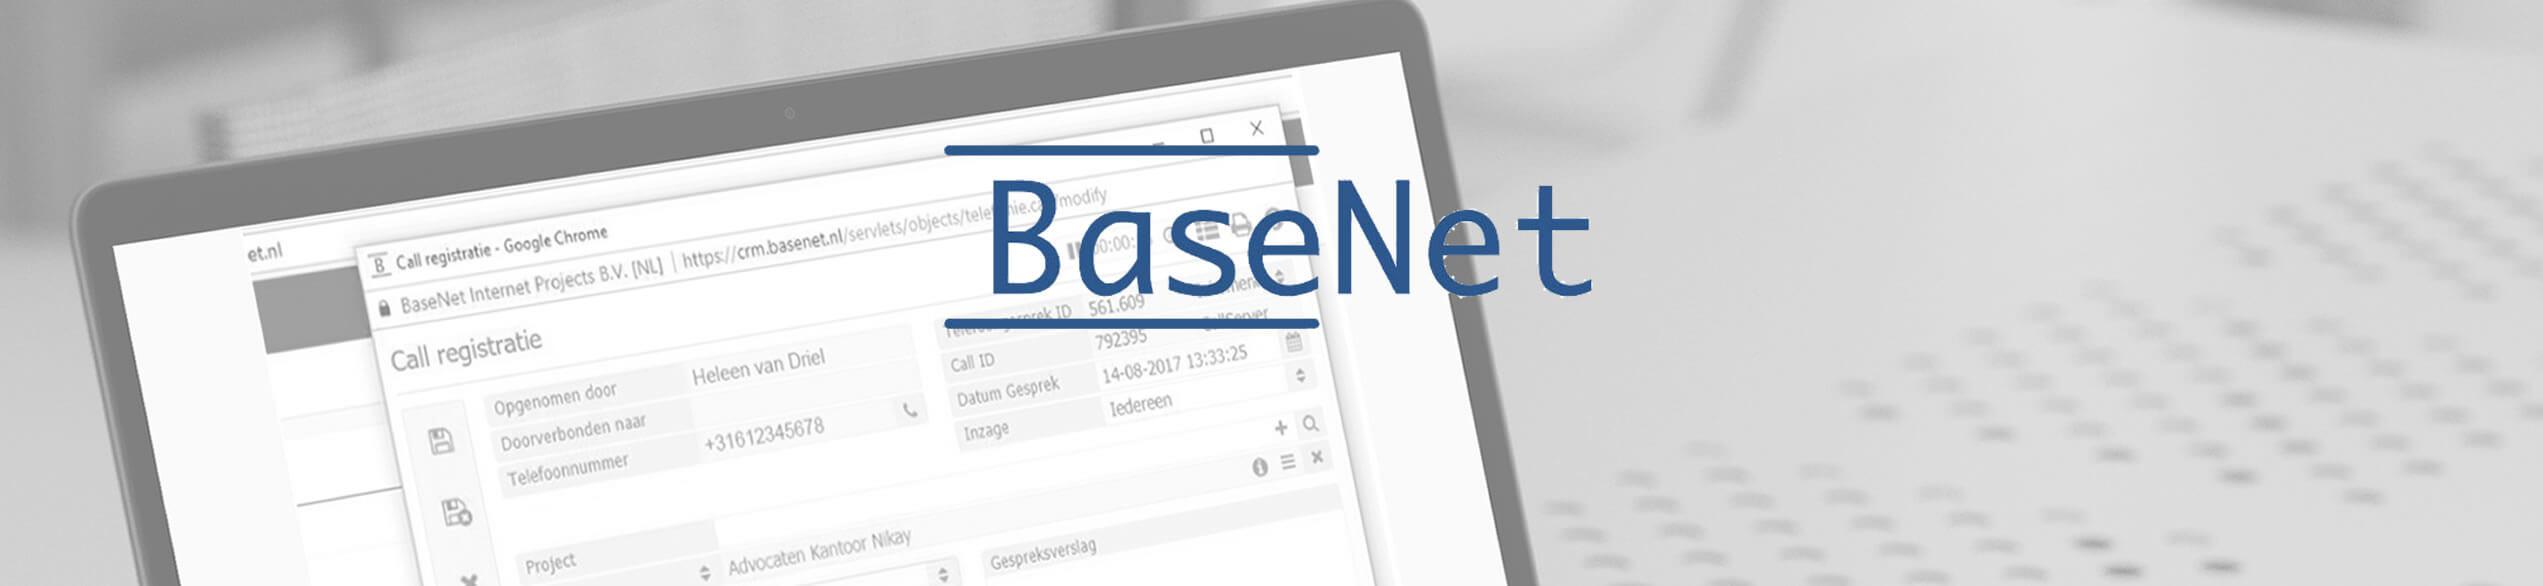 Basenet